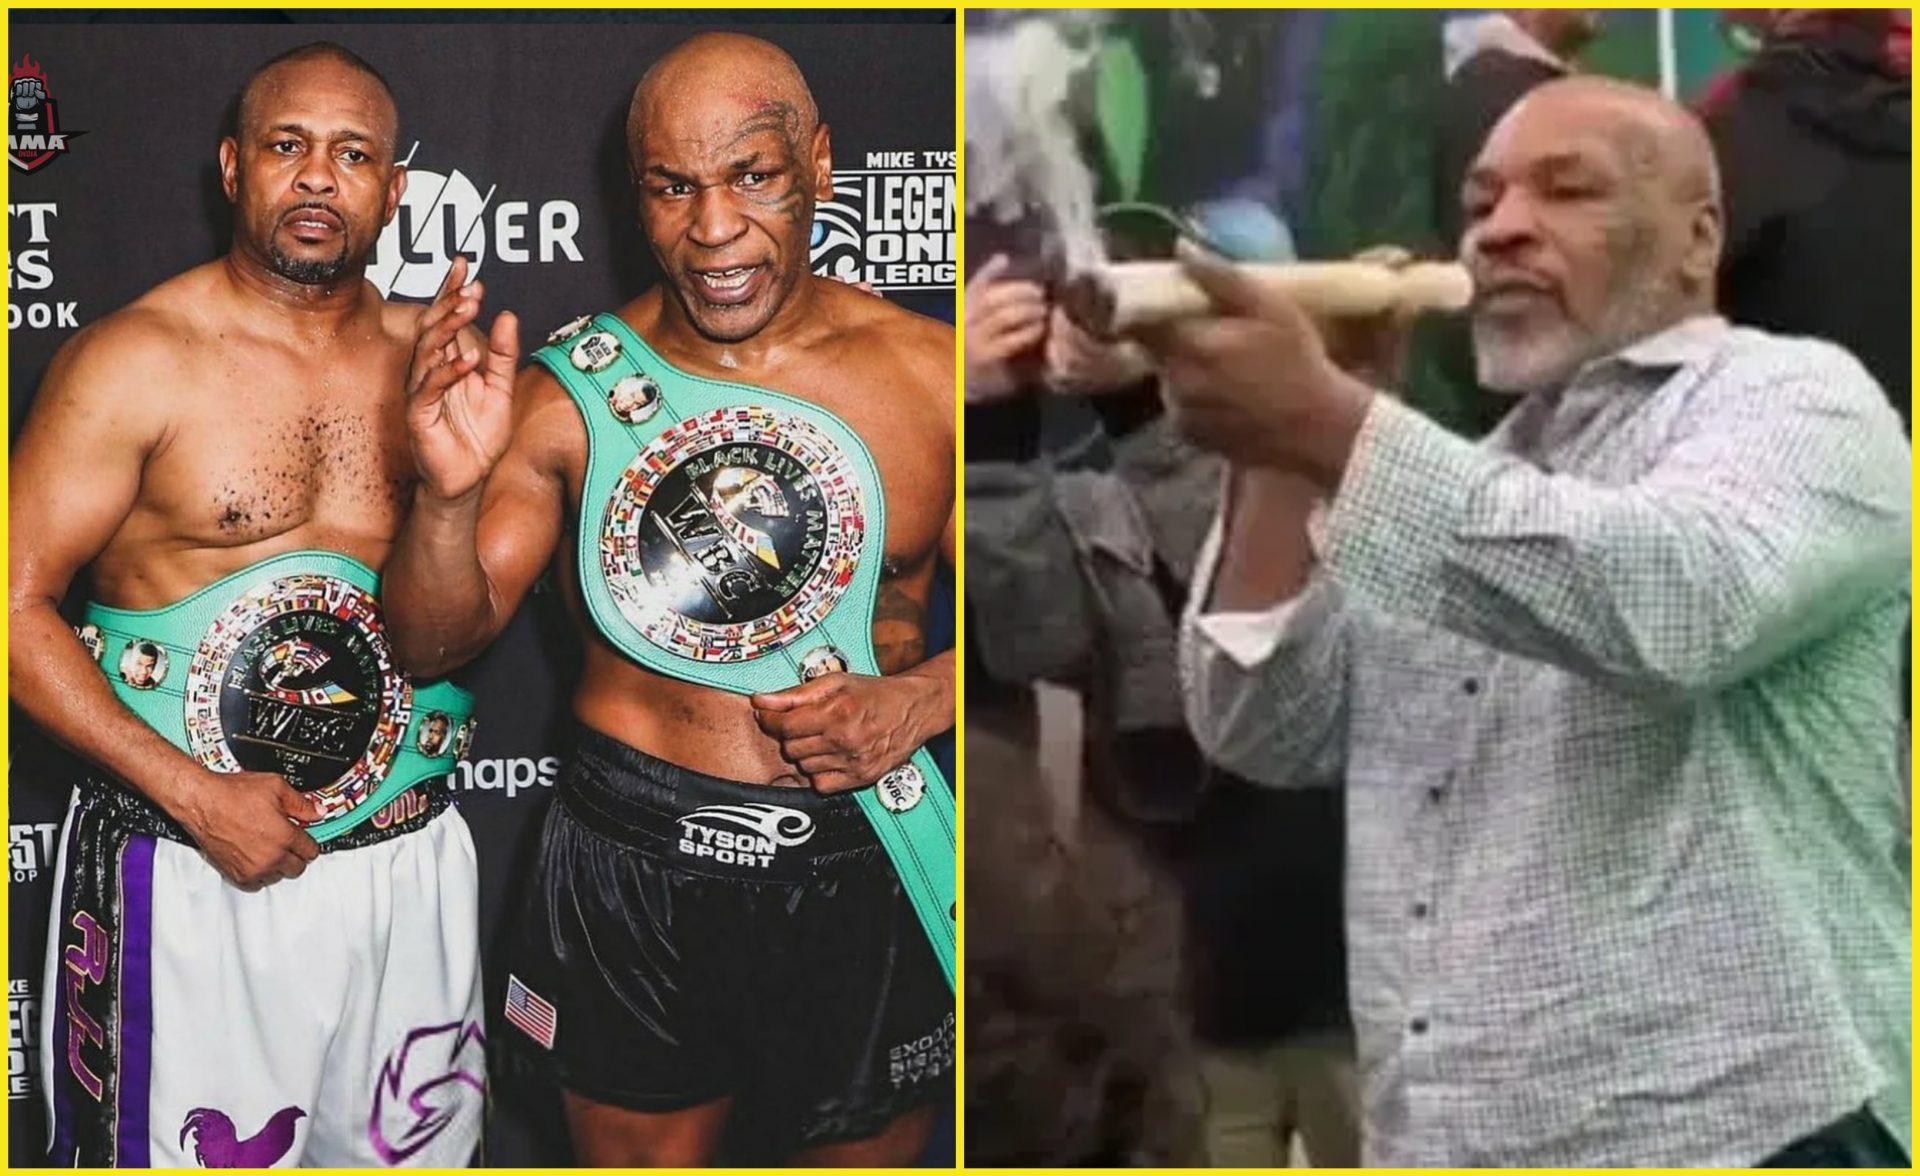 Mike Tyson reveals he smoked Marijuana before Roy Jones Jr fight - Mike Tyson